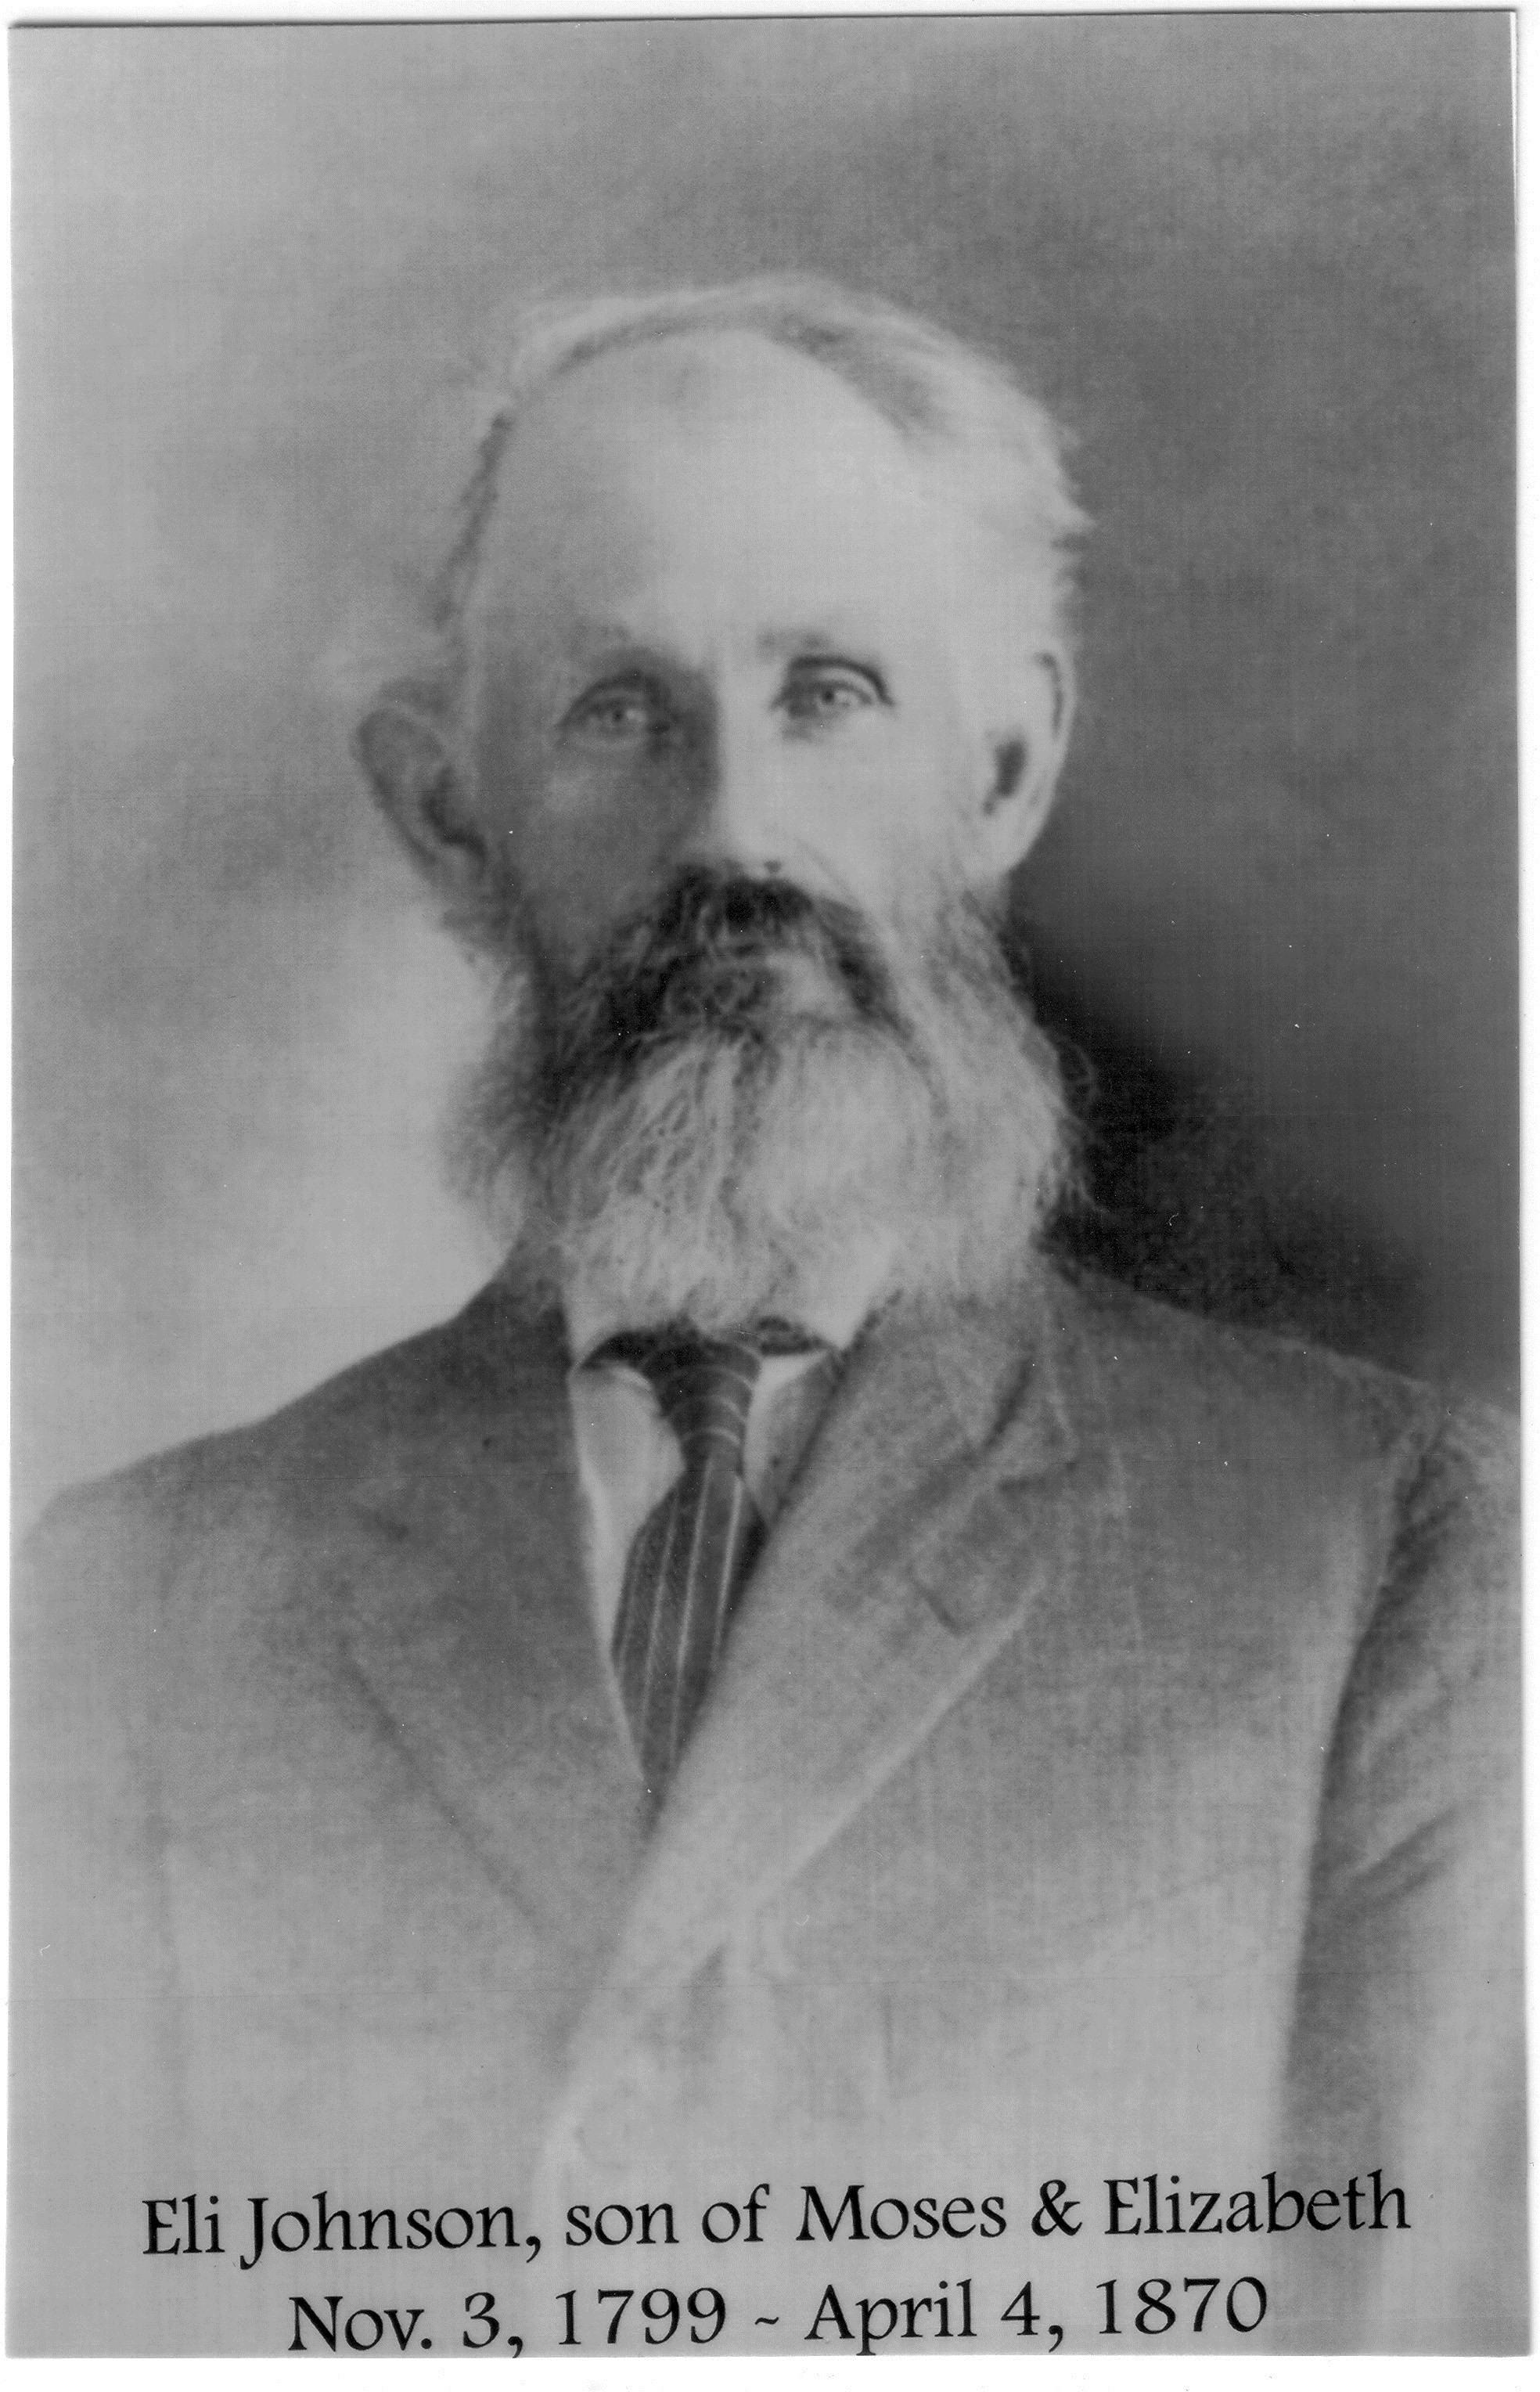 Eli Johnson